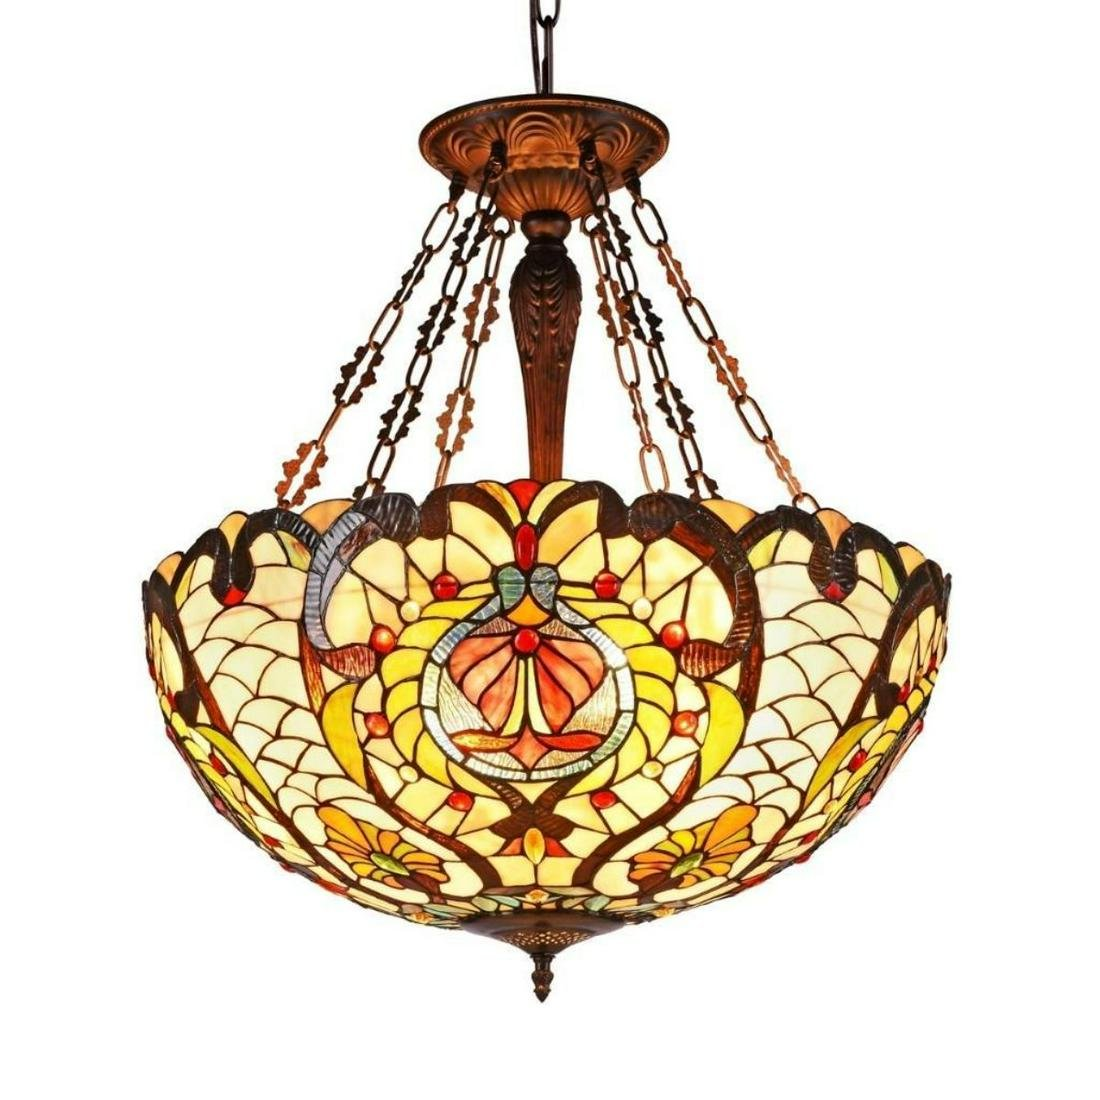 Tiffany-style Ceiling Pendant